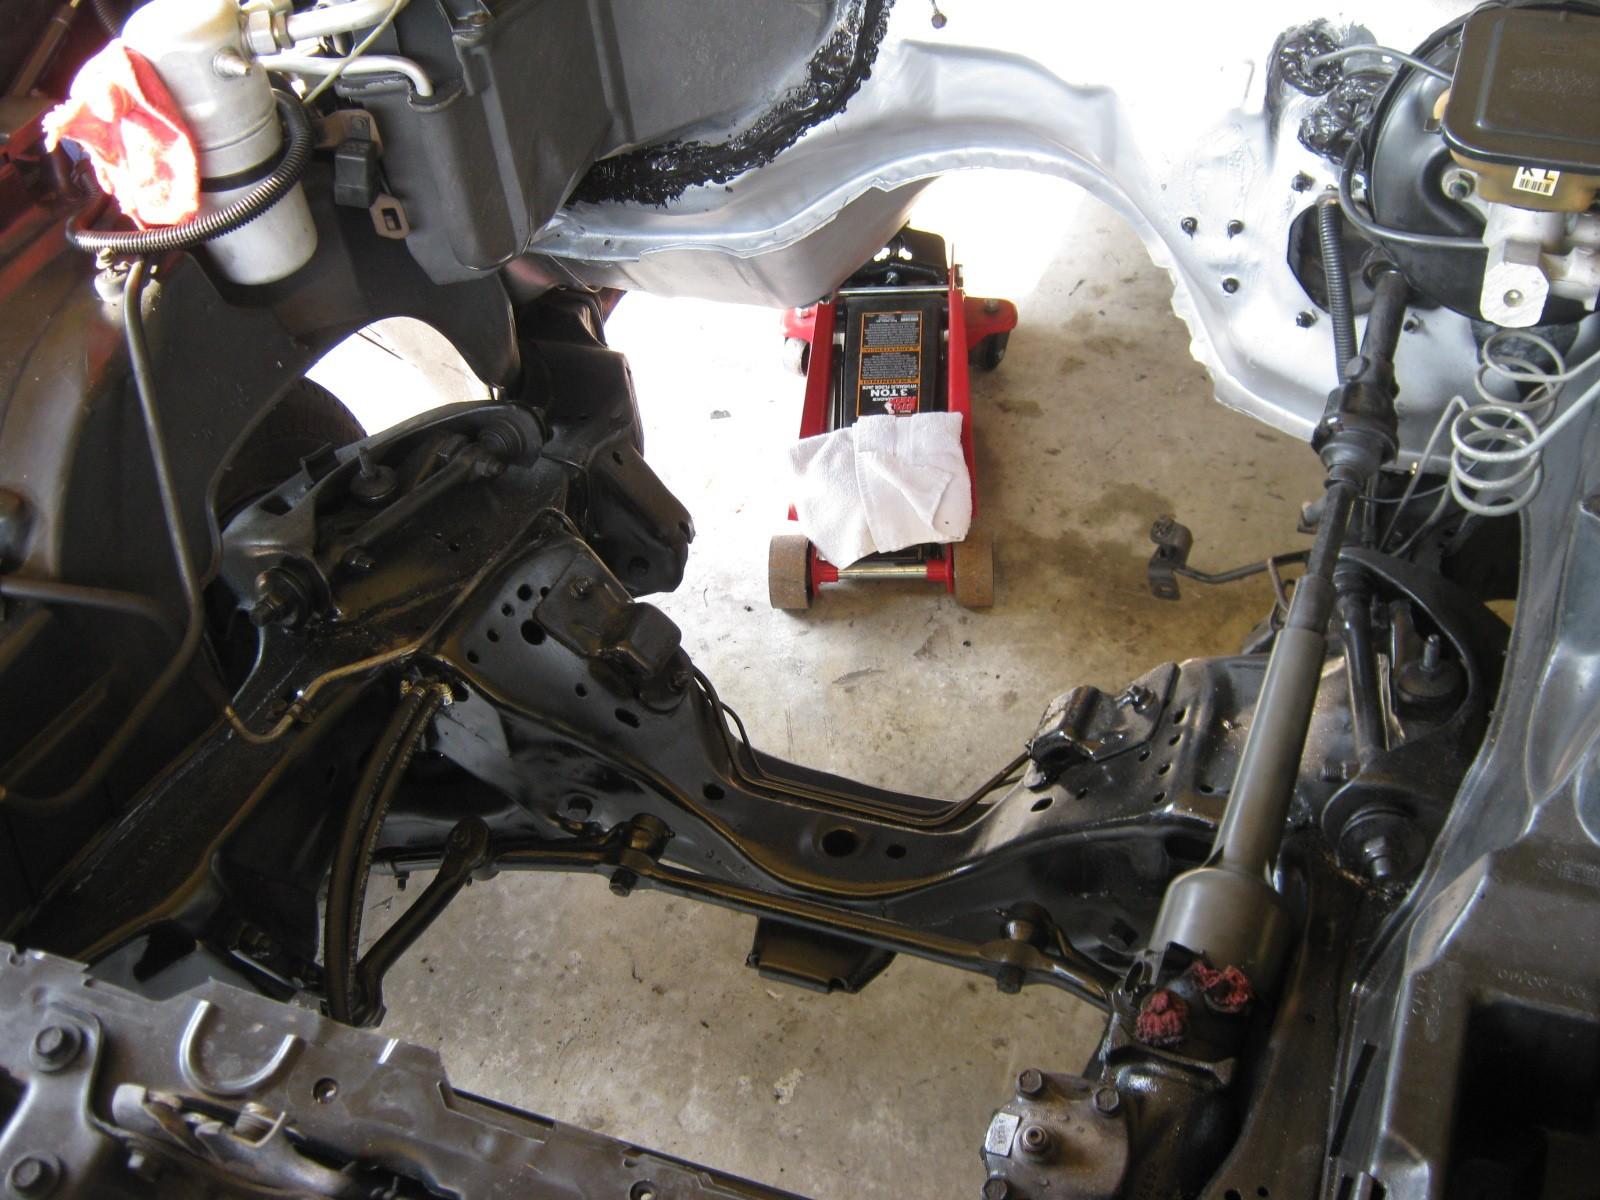 Oldsmobile 307 Engine Diagram | My Wiring DIagram